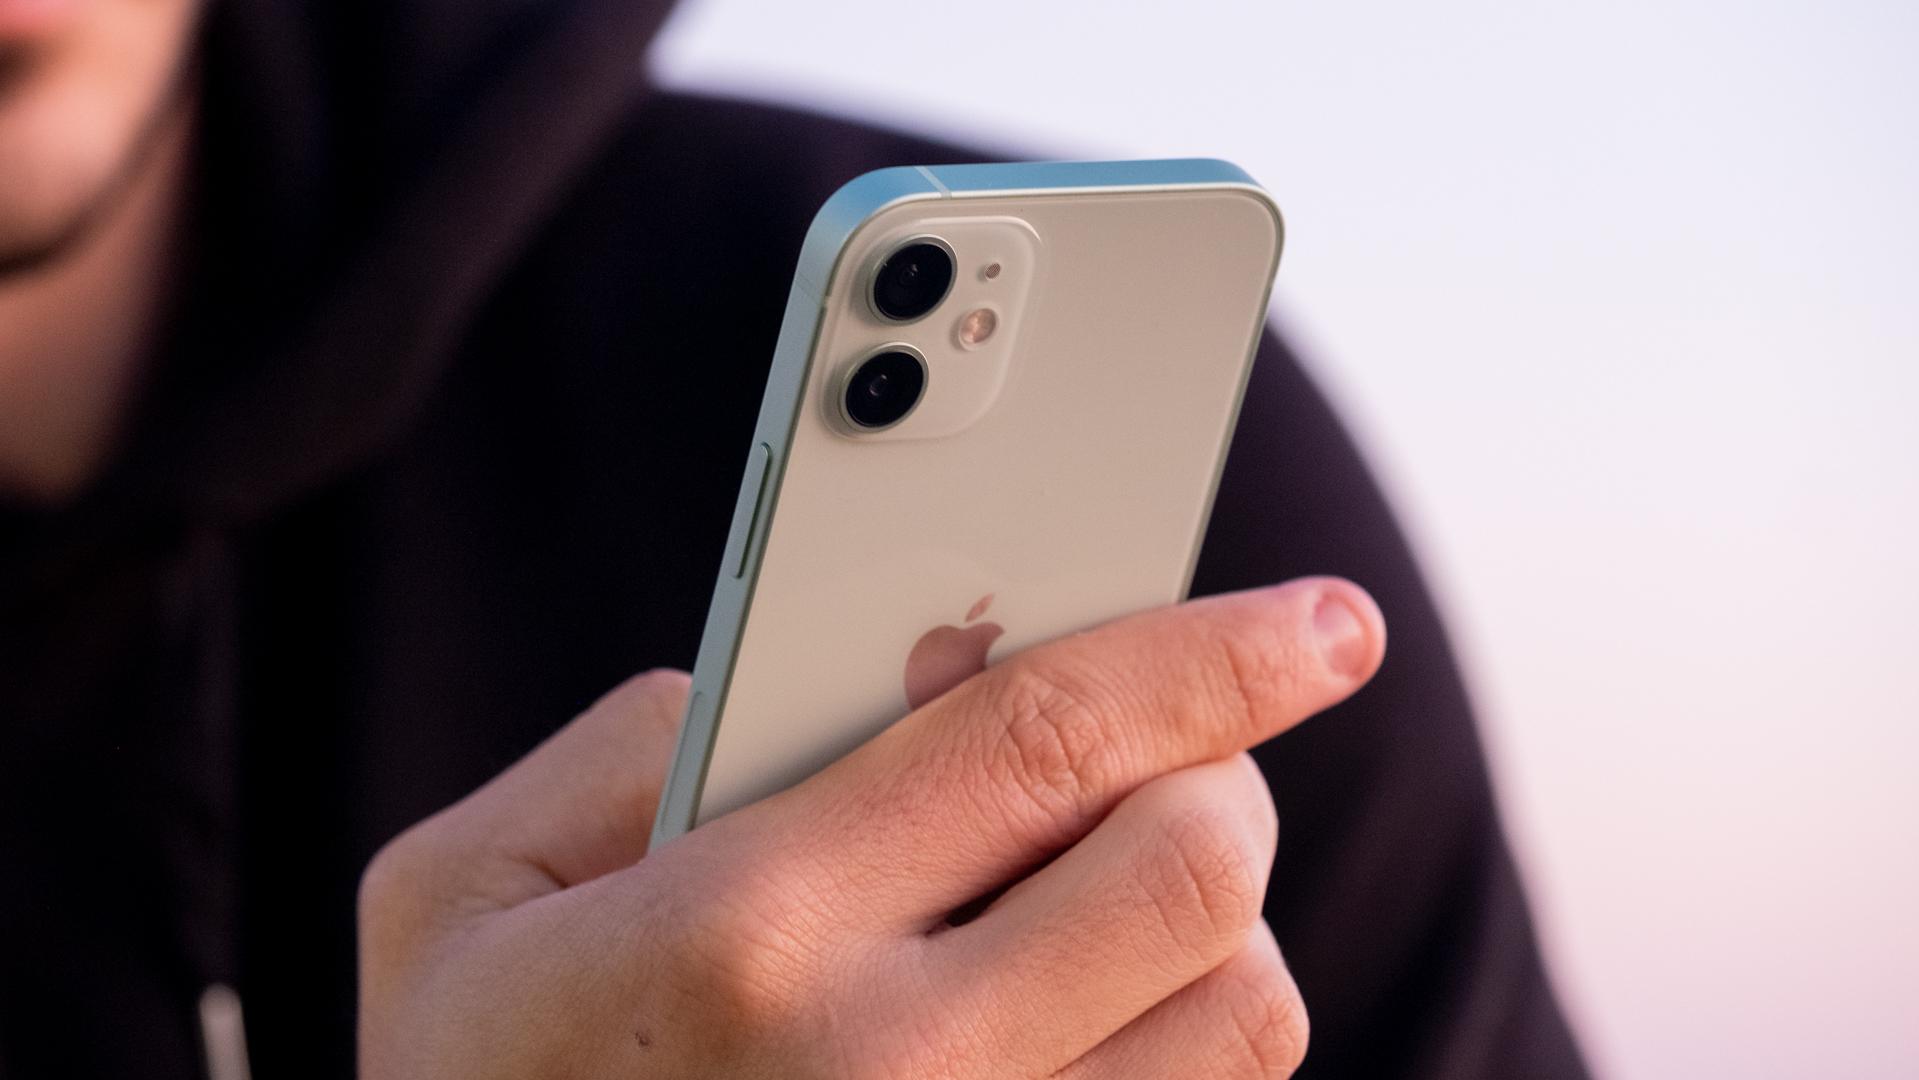 iPhone 12 Mini back in hand 2